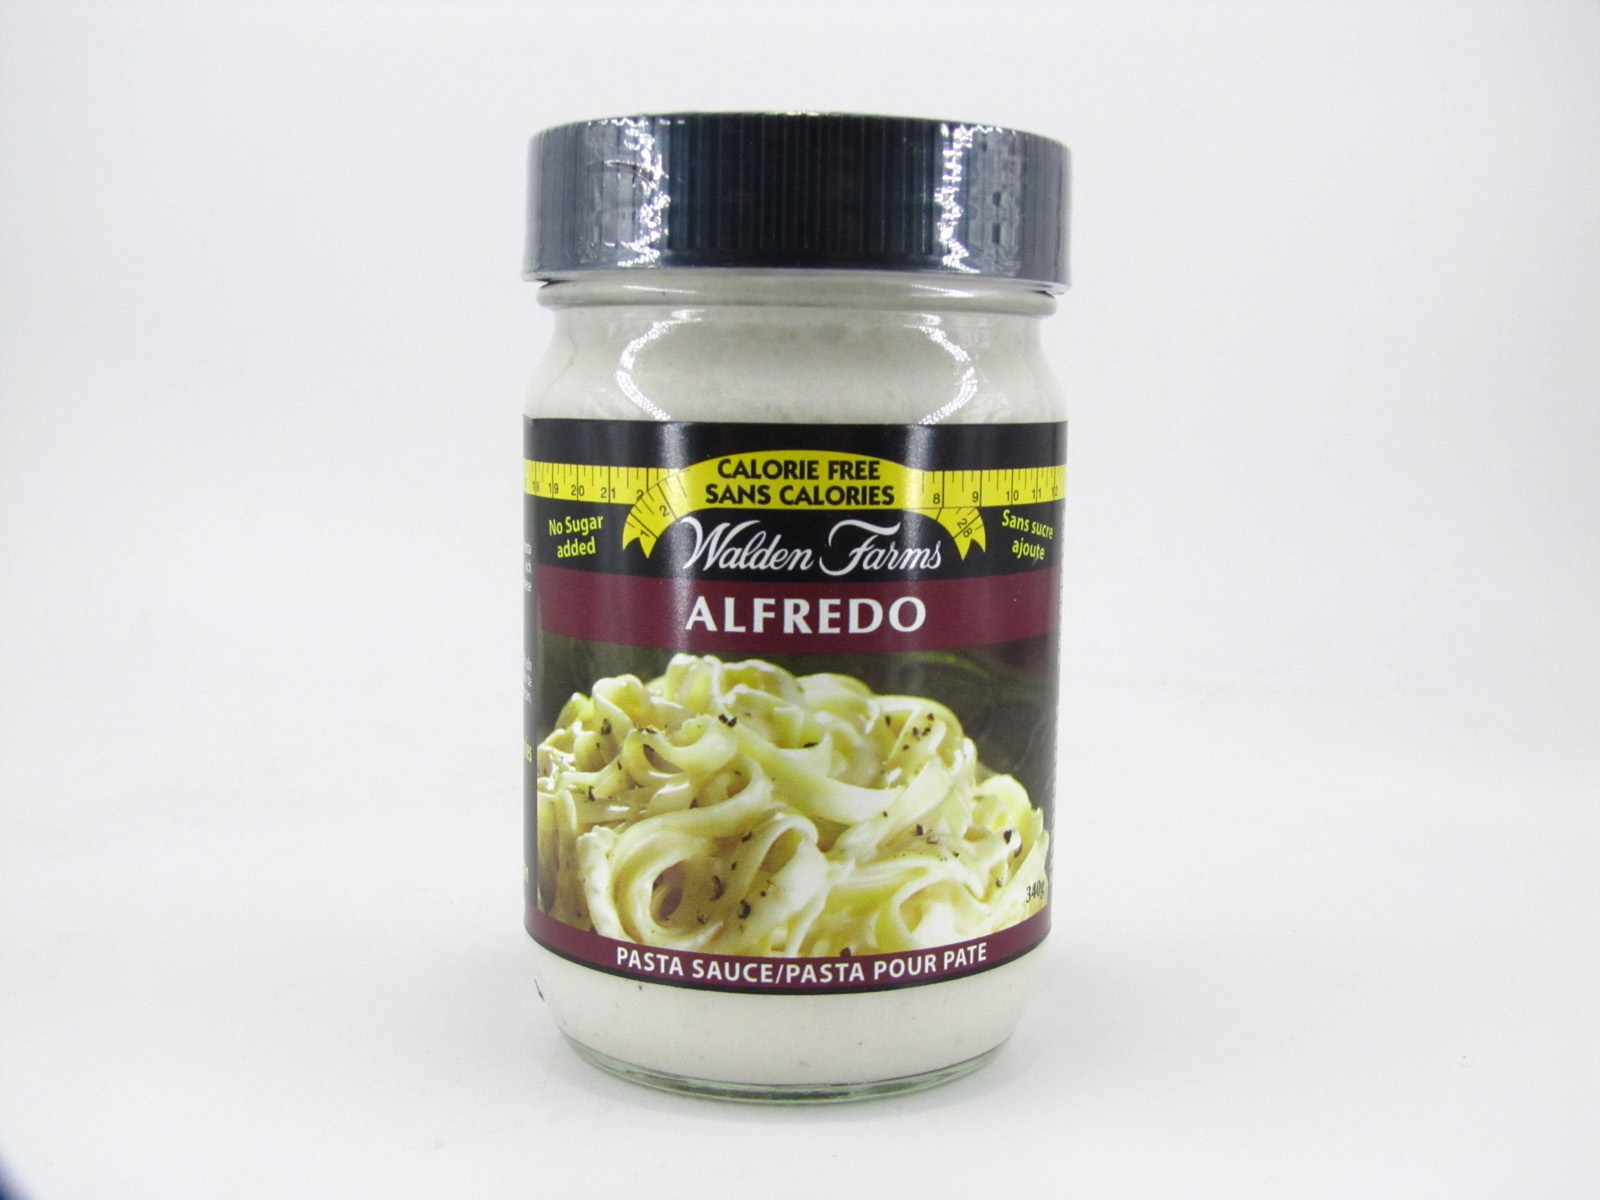 Waldenfarms Pasta Sauce - Alfredo - front view